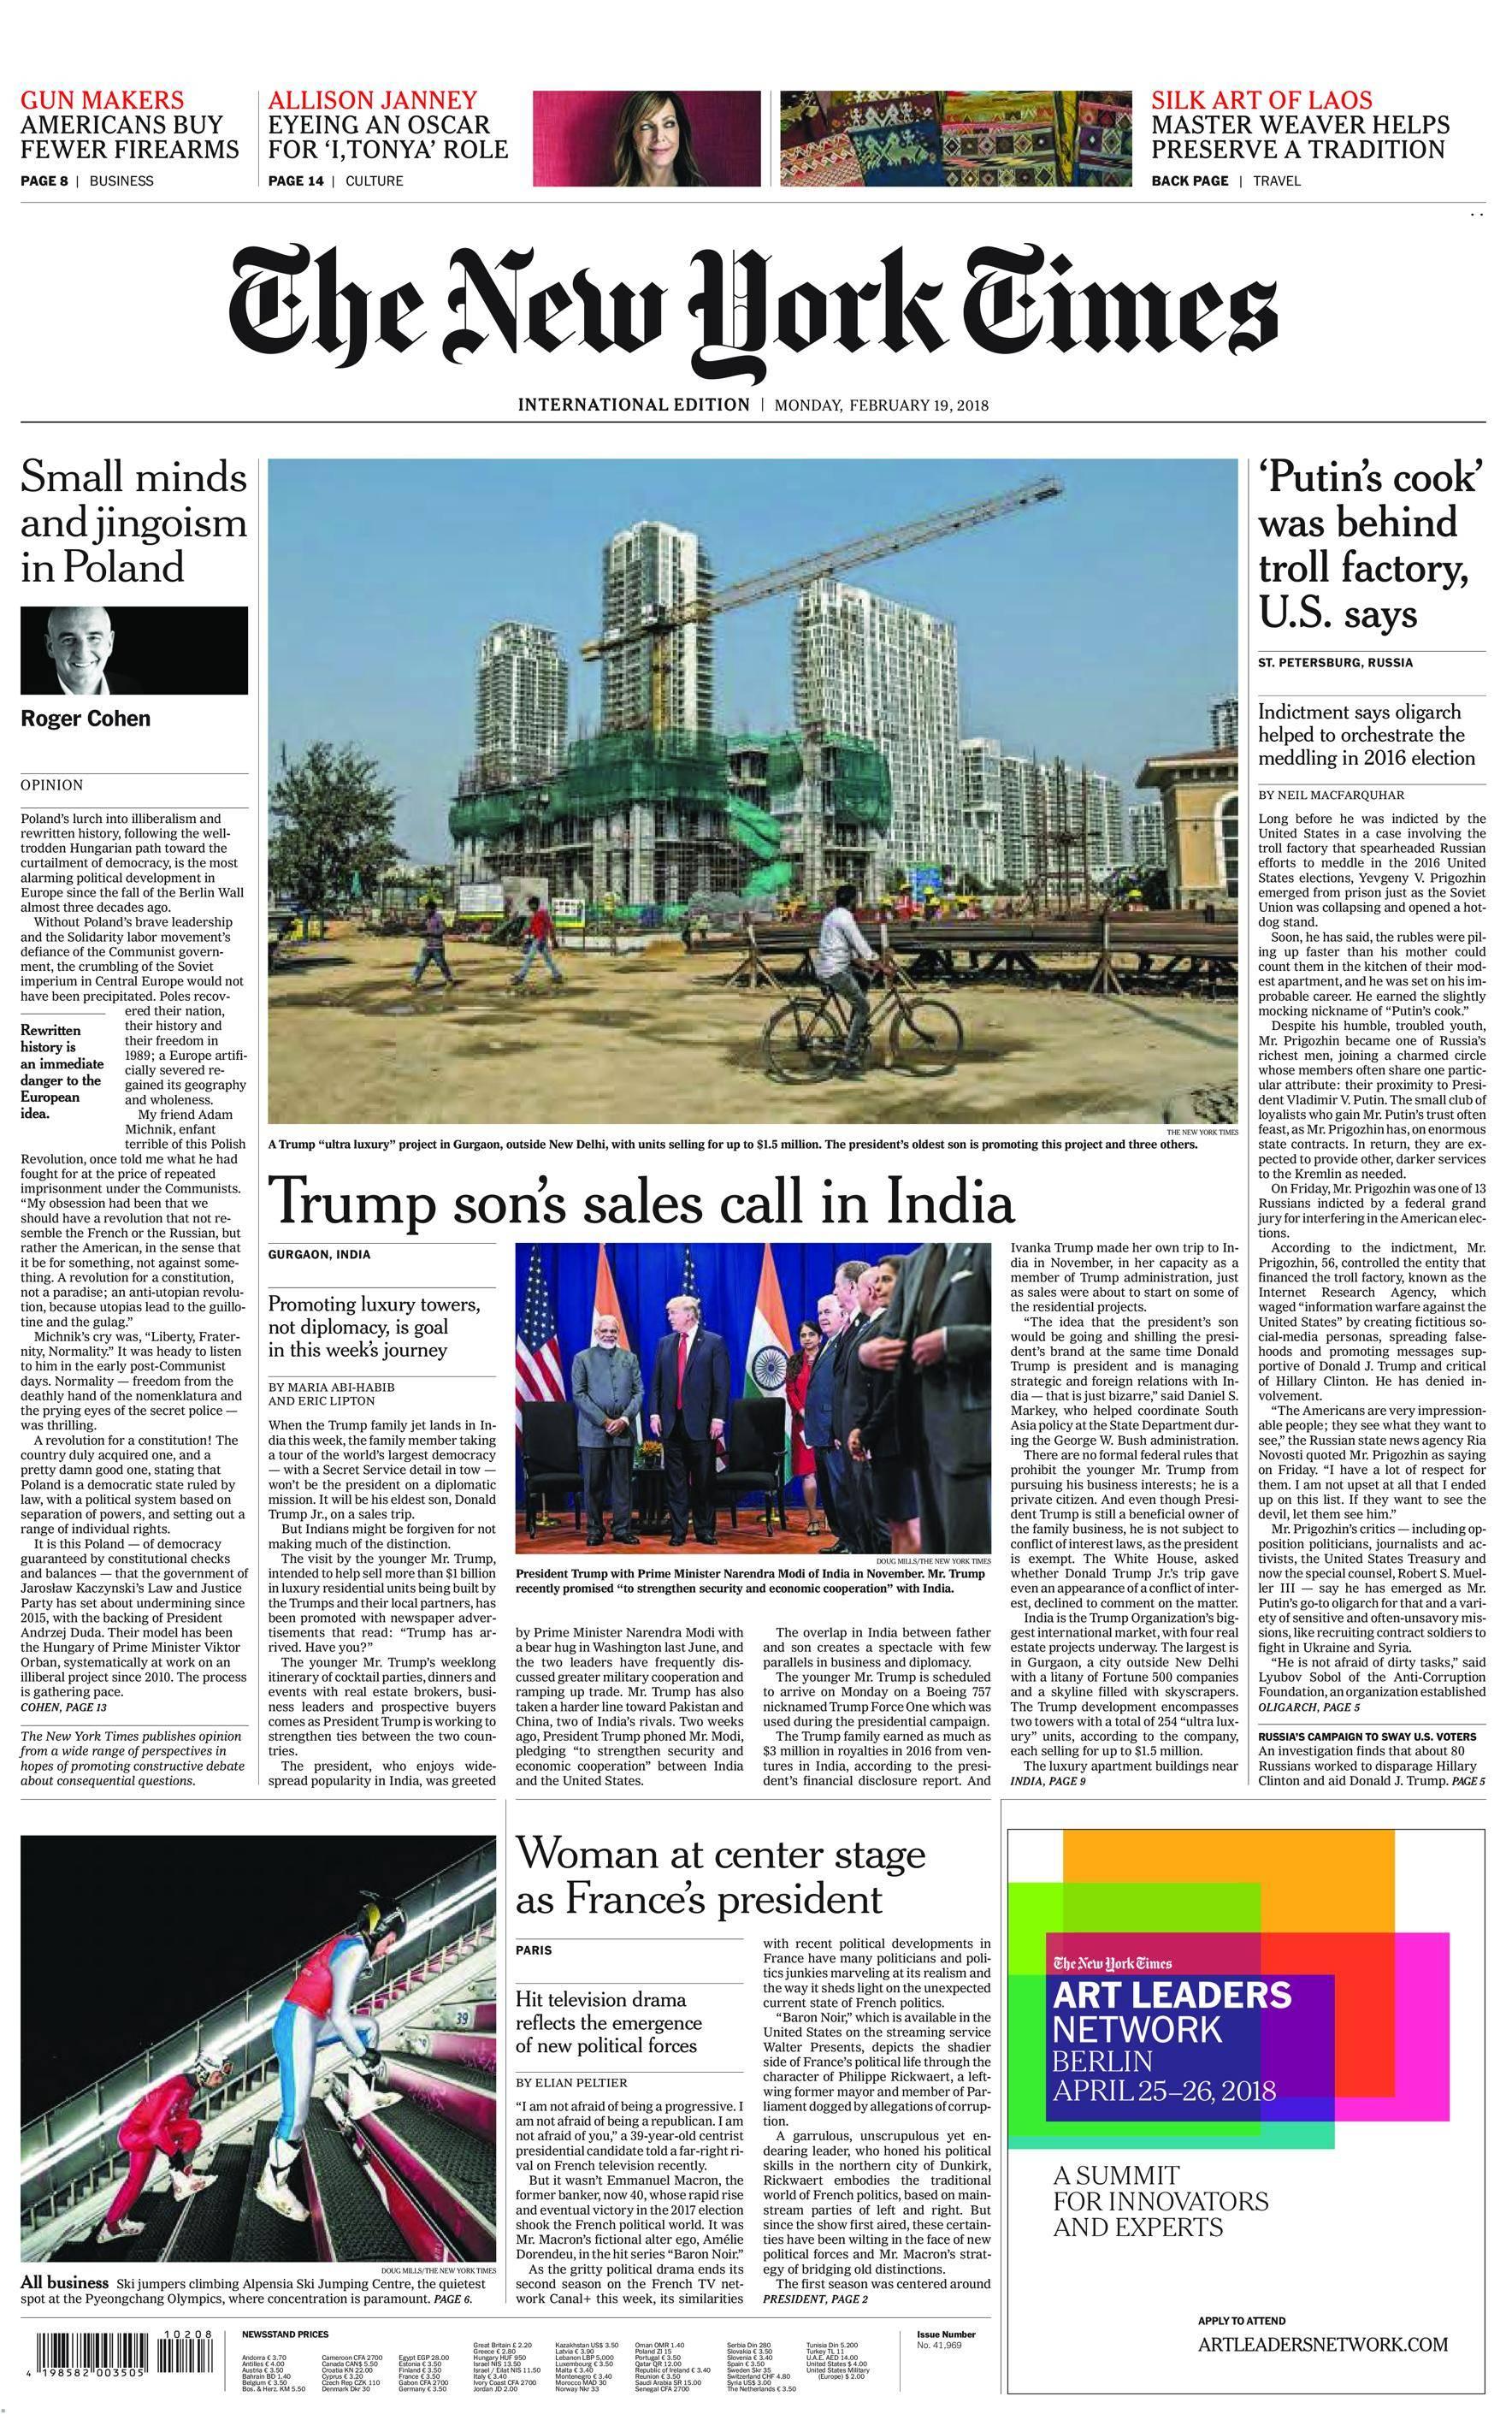 International New York Times - 19 February 2018